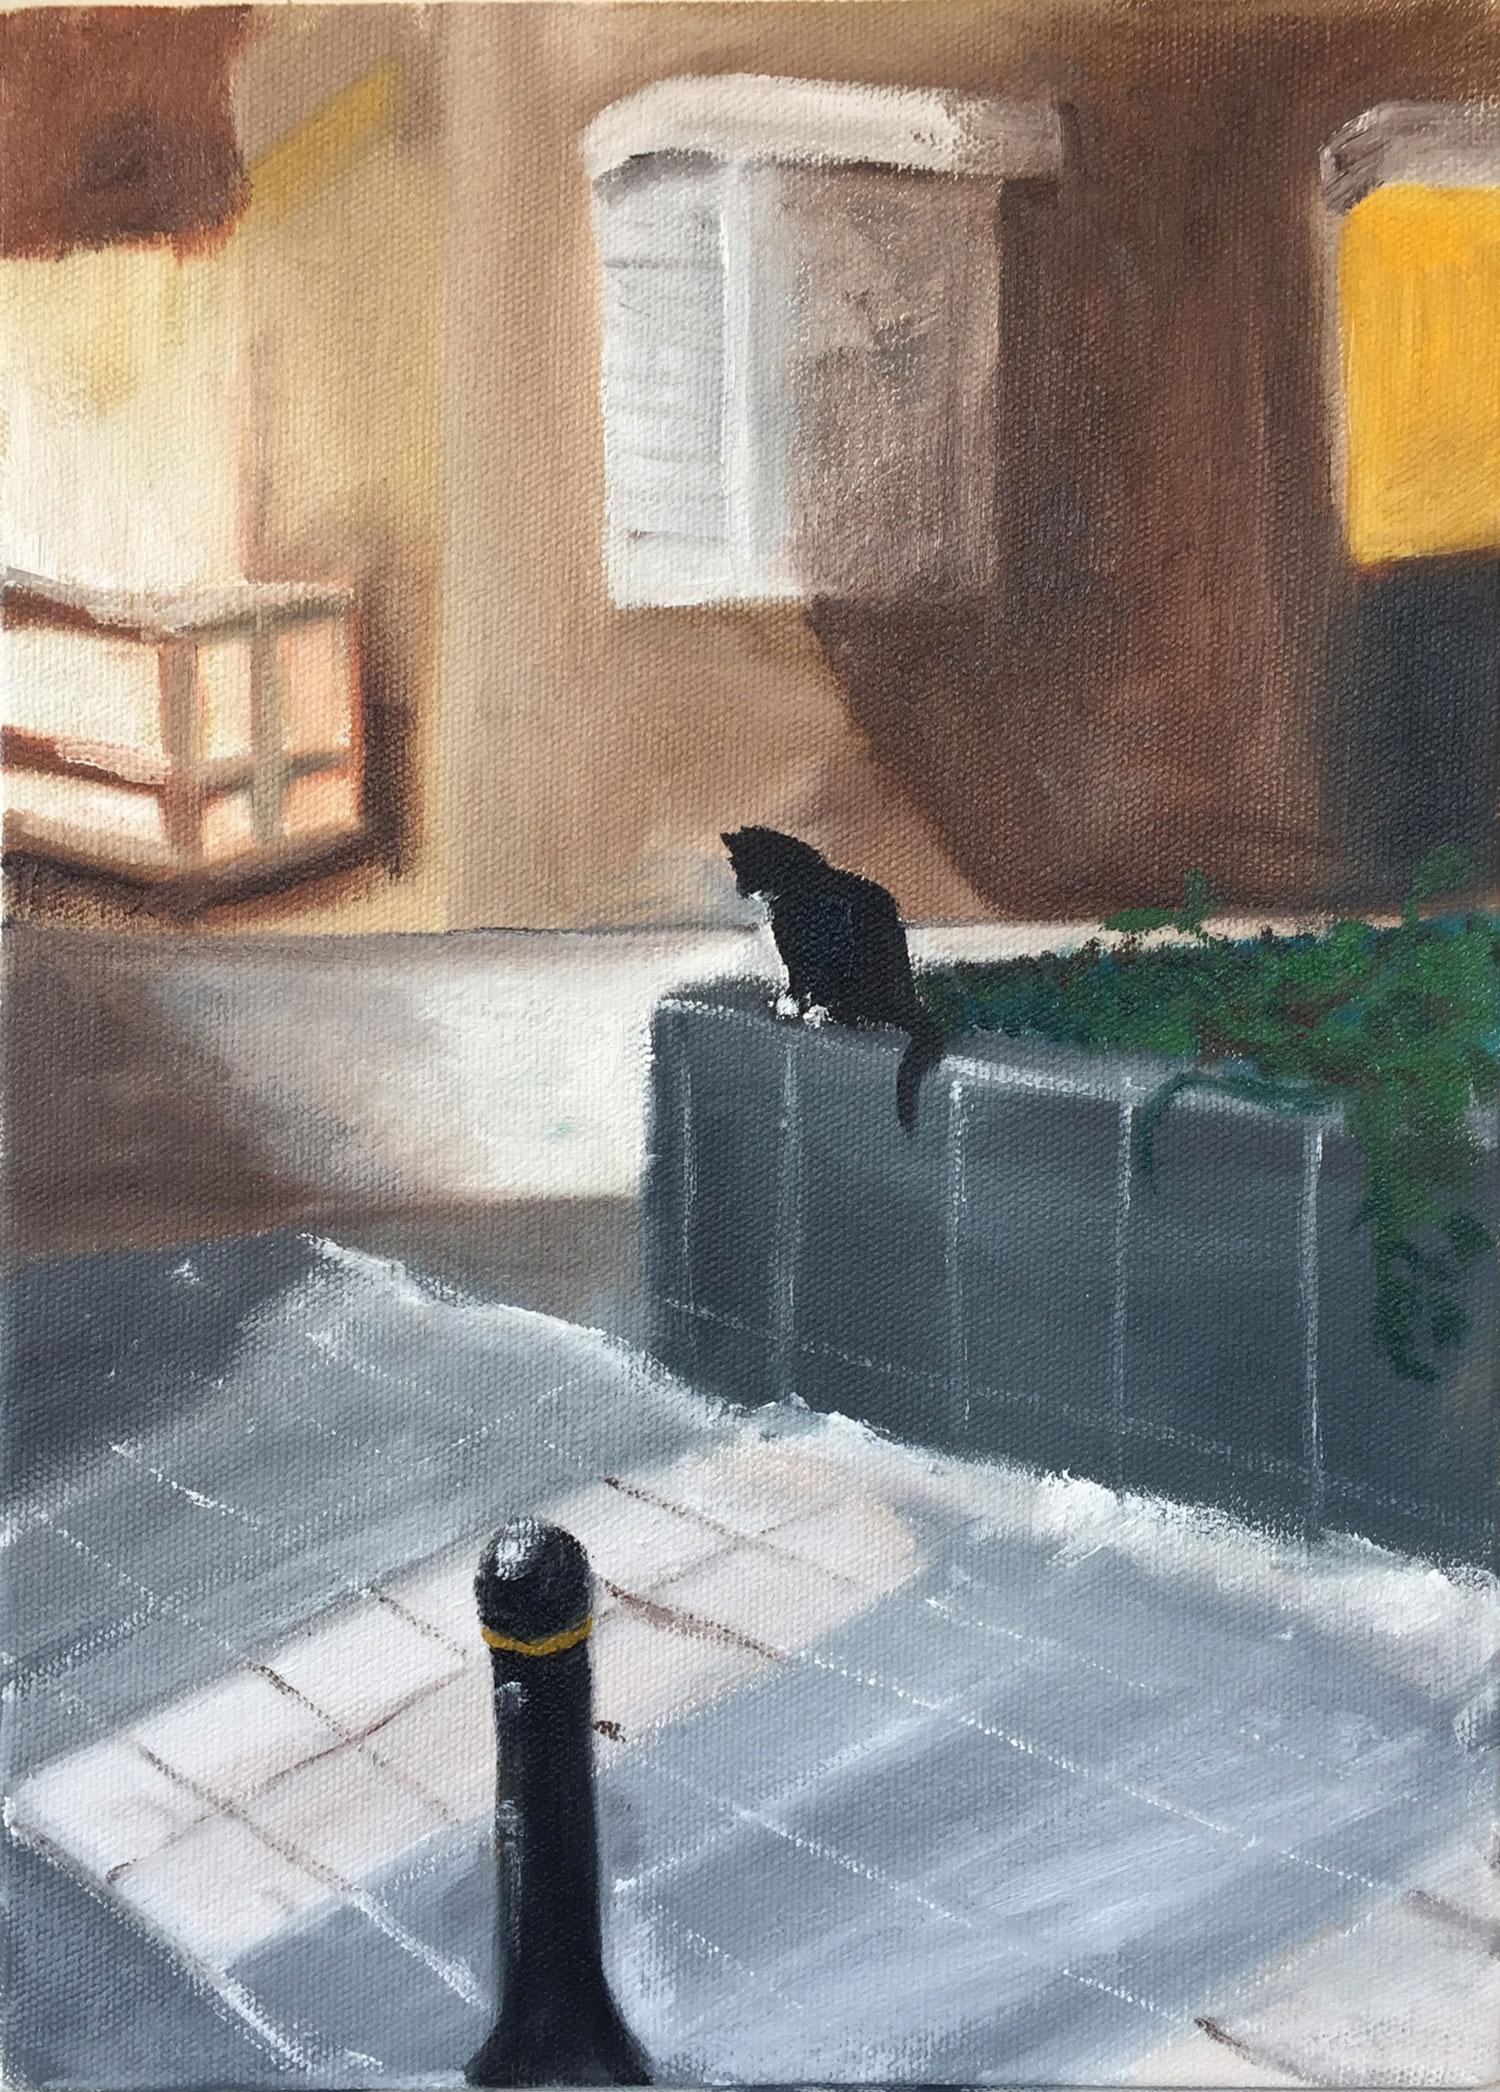 25x35 oil on canvas